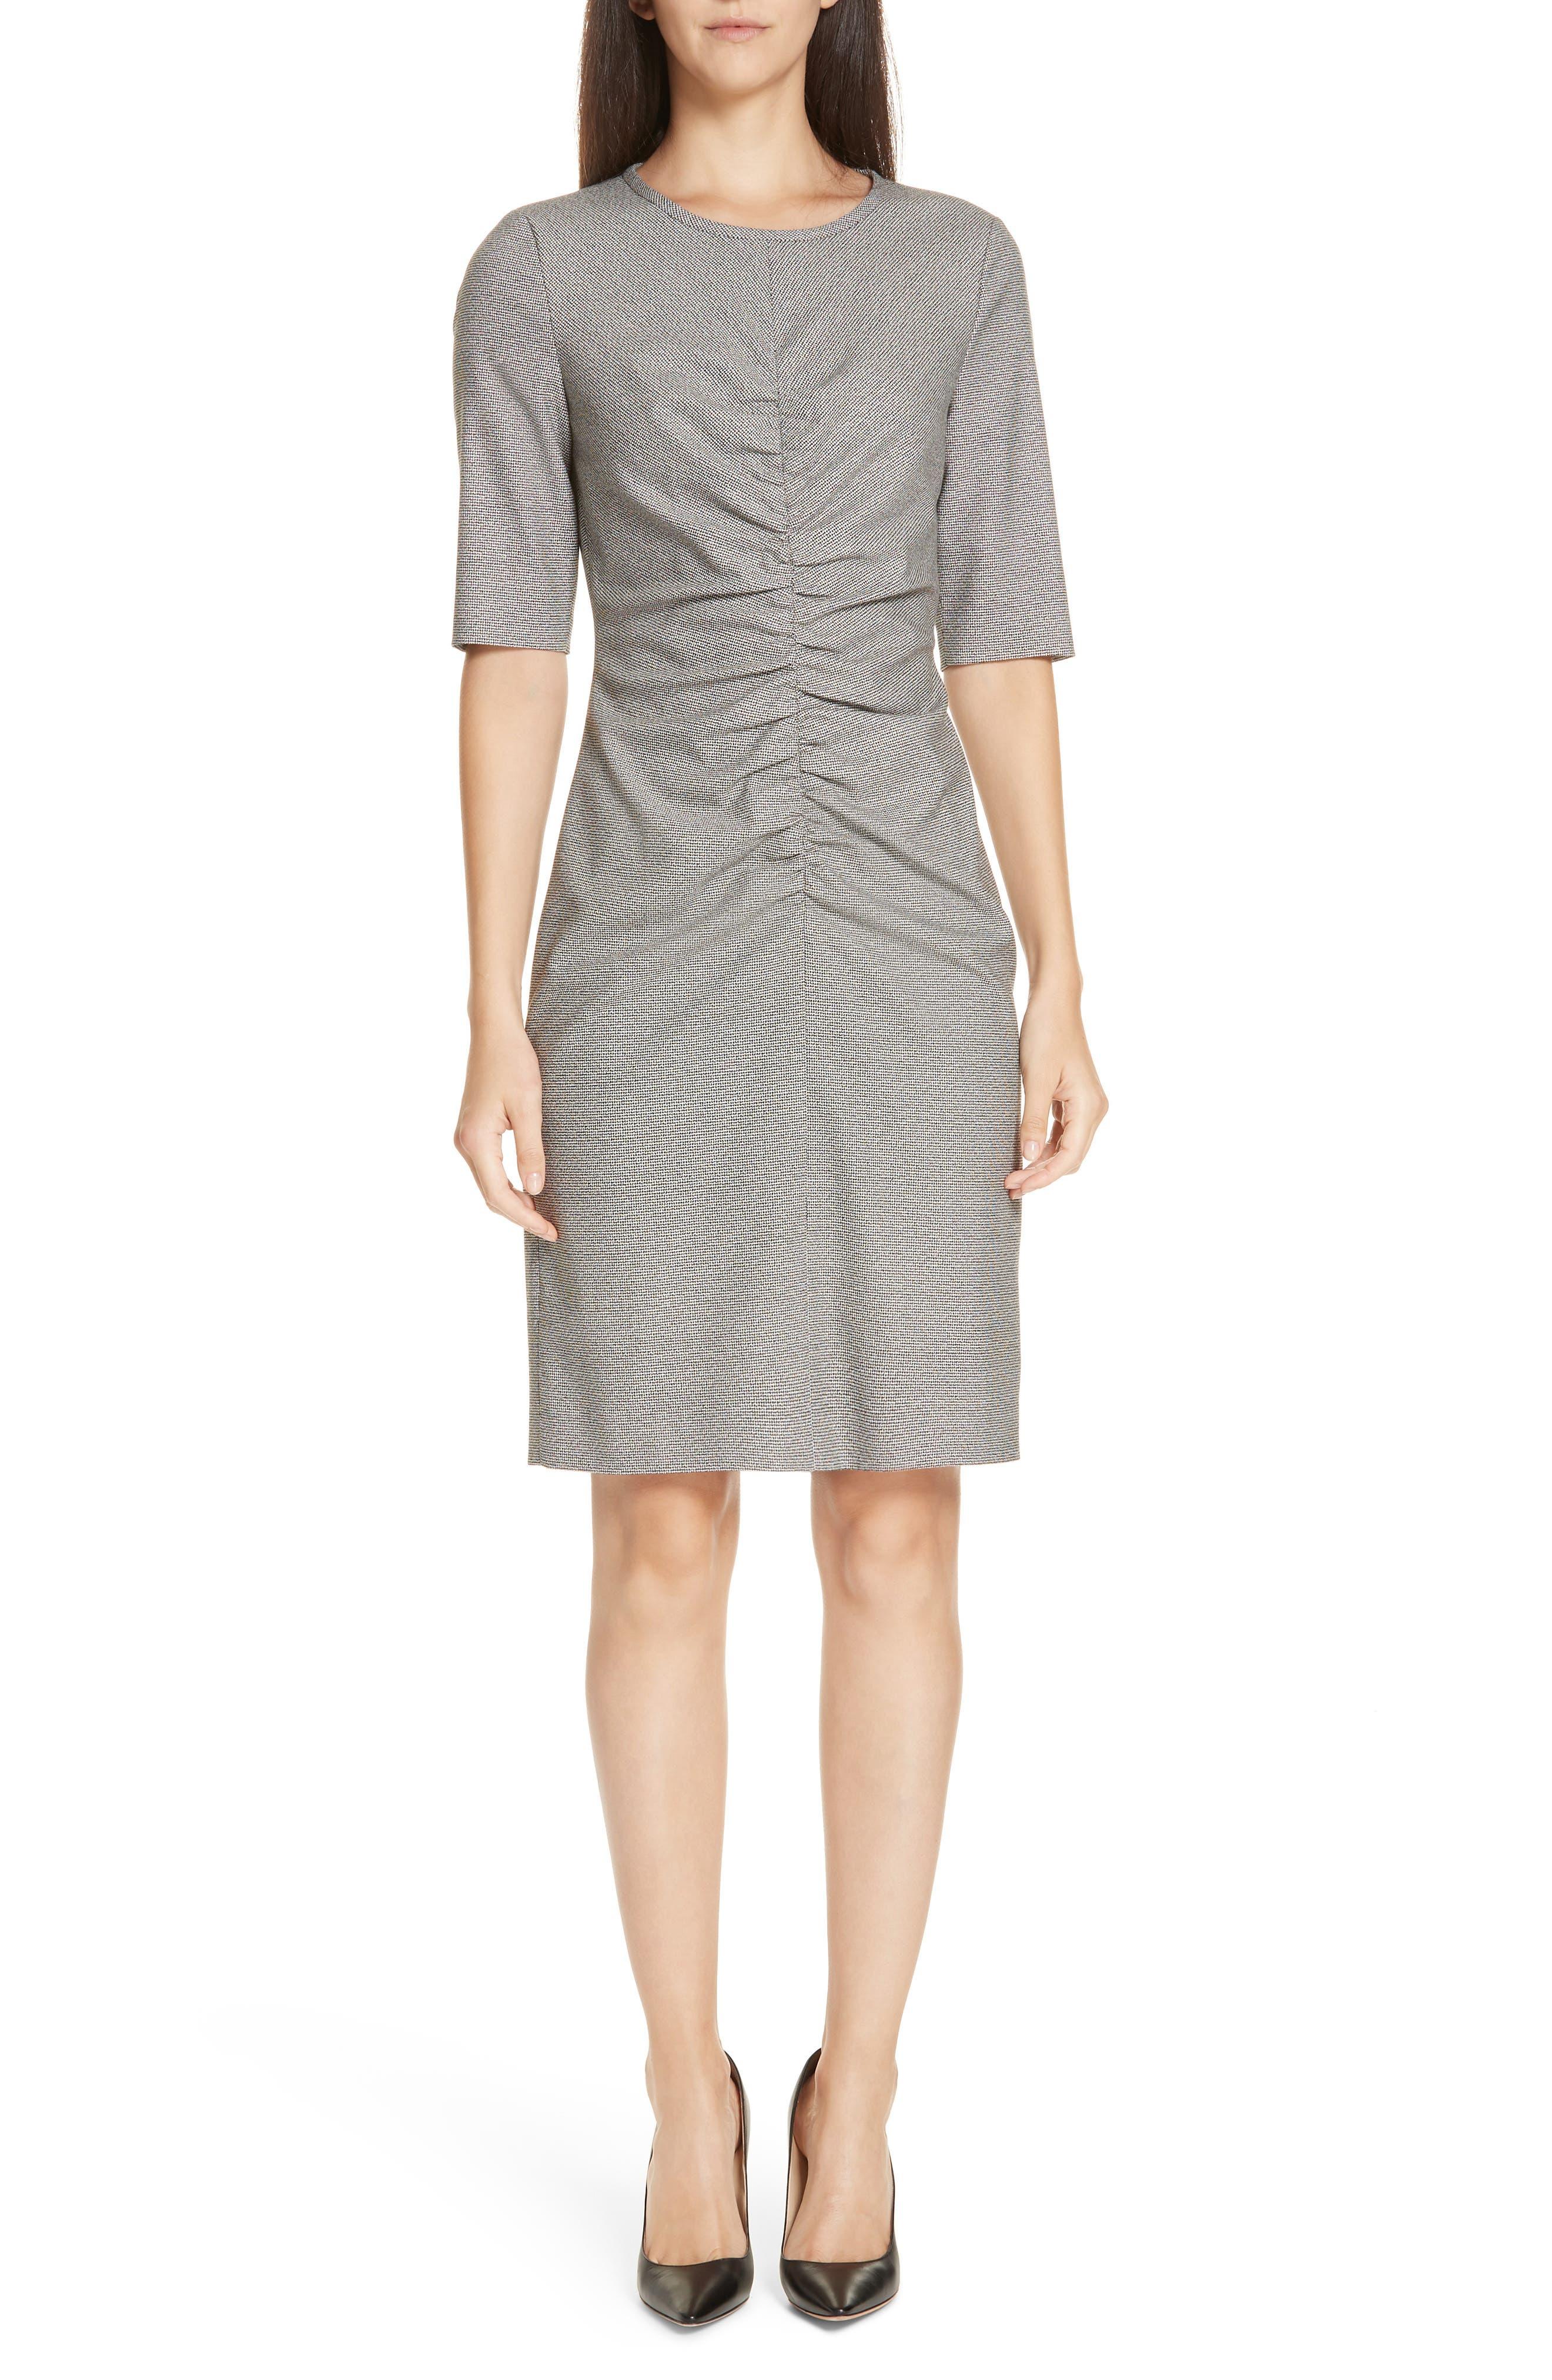 Dirafia Blurred Optic Dress,                         Main,                         color, BLACK FANTASY